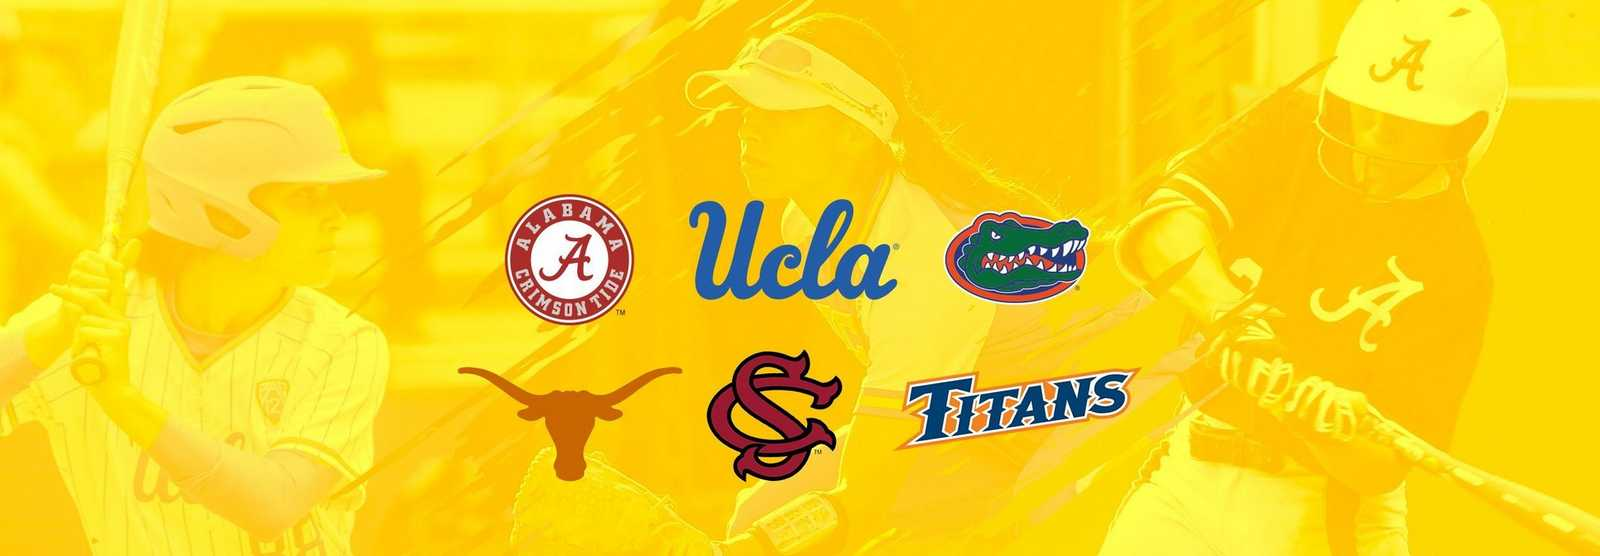 elite-college-softball-programs